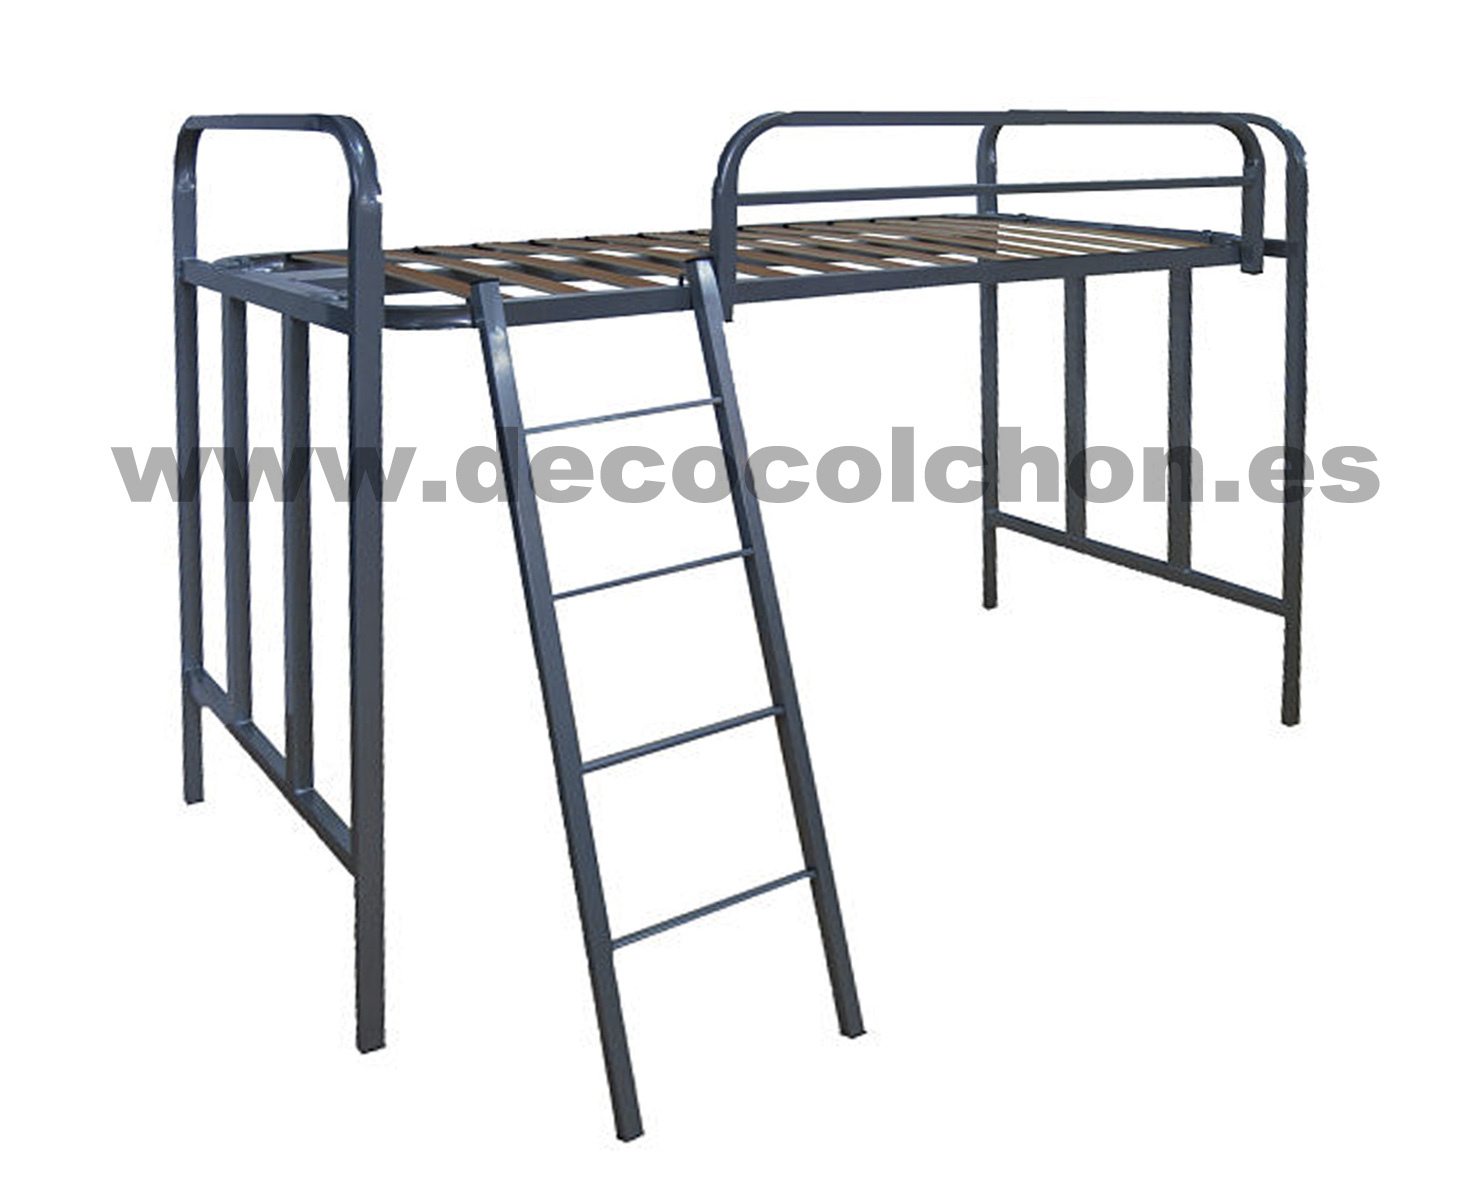 Litera francia somieres bases canap s camas y colchones for Camas 110x200